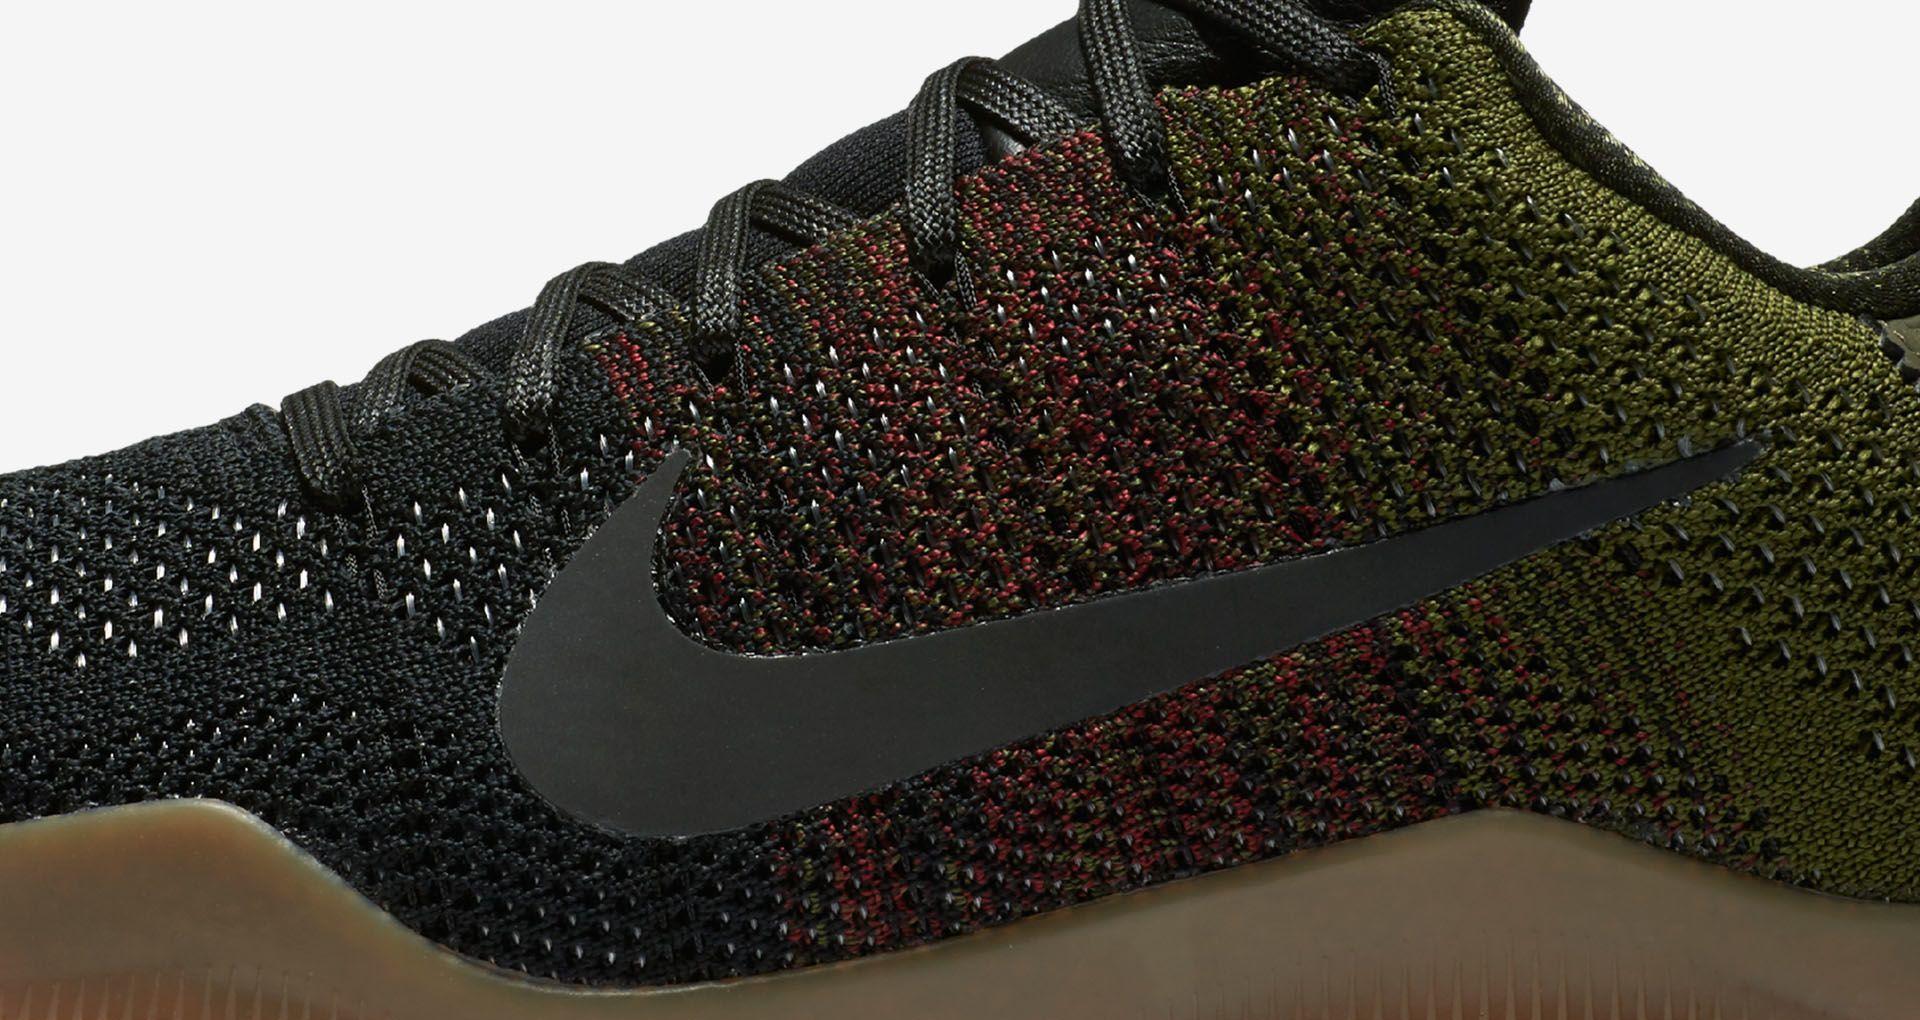 reputable site a184a daa16 Nike Kobe 11 Elite Low  Black Horse  Release Date